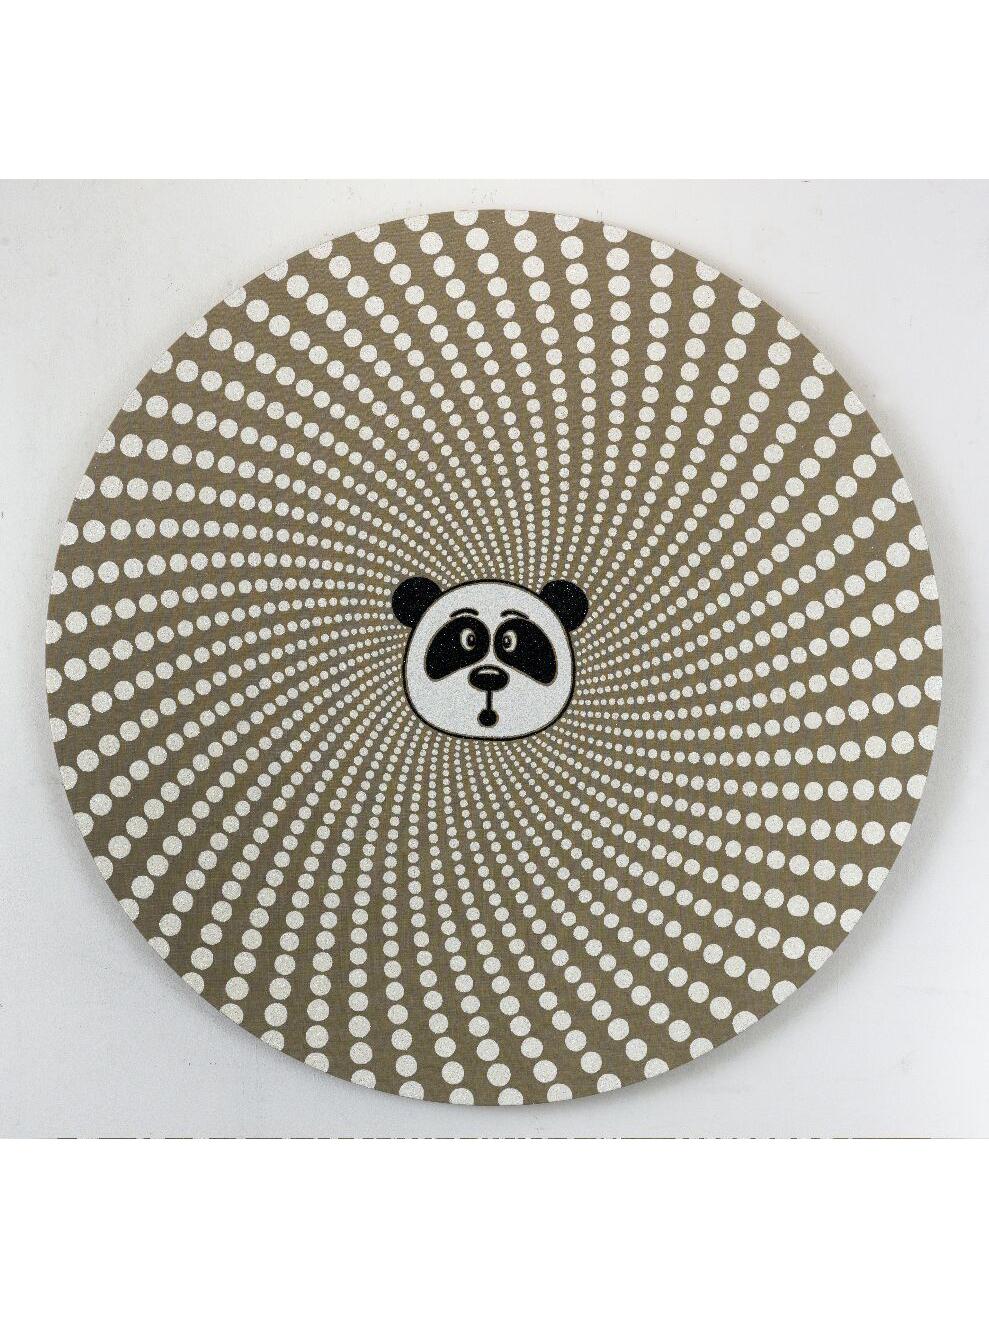 Hypnotic Panda #2